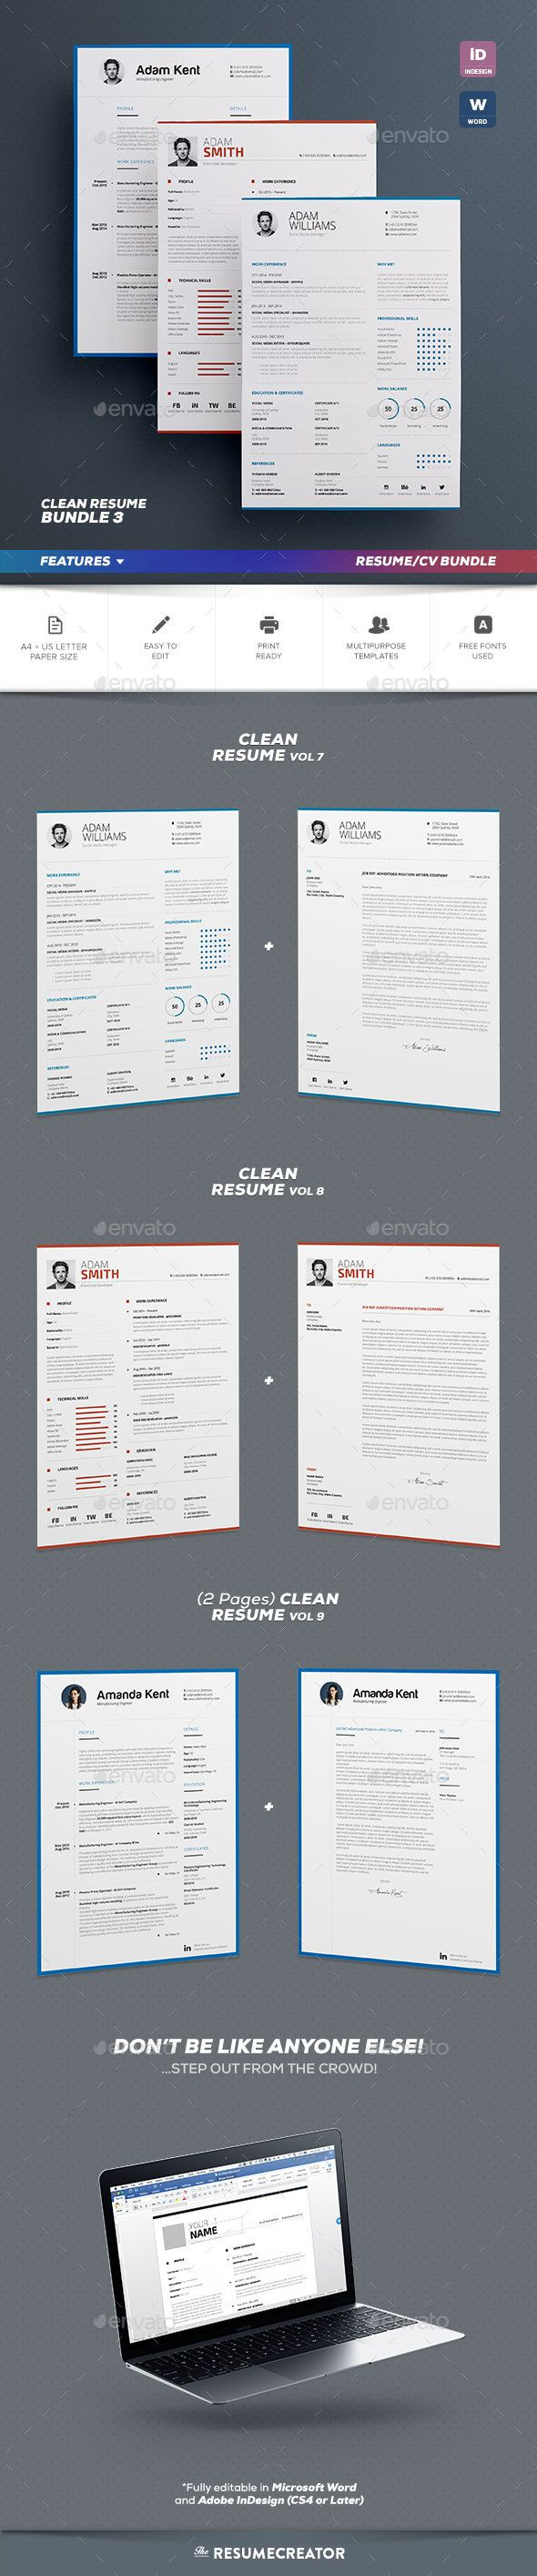 cv and resume format%0A Clean Resume Cv Bundle Vol